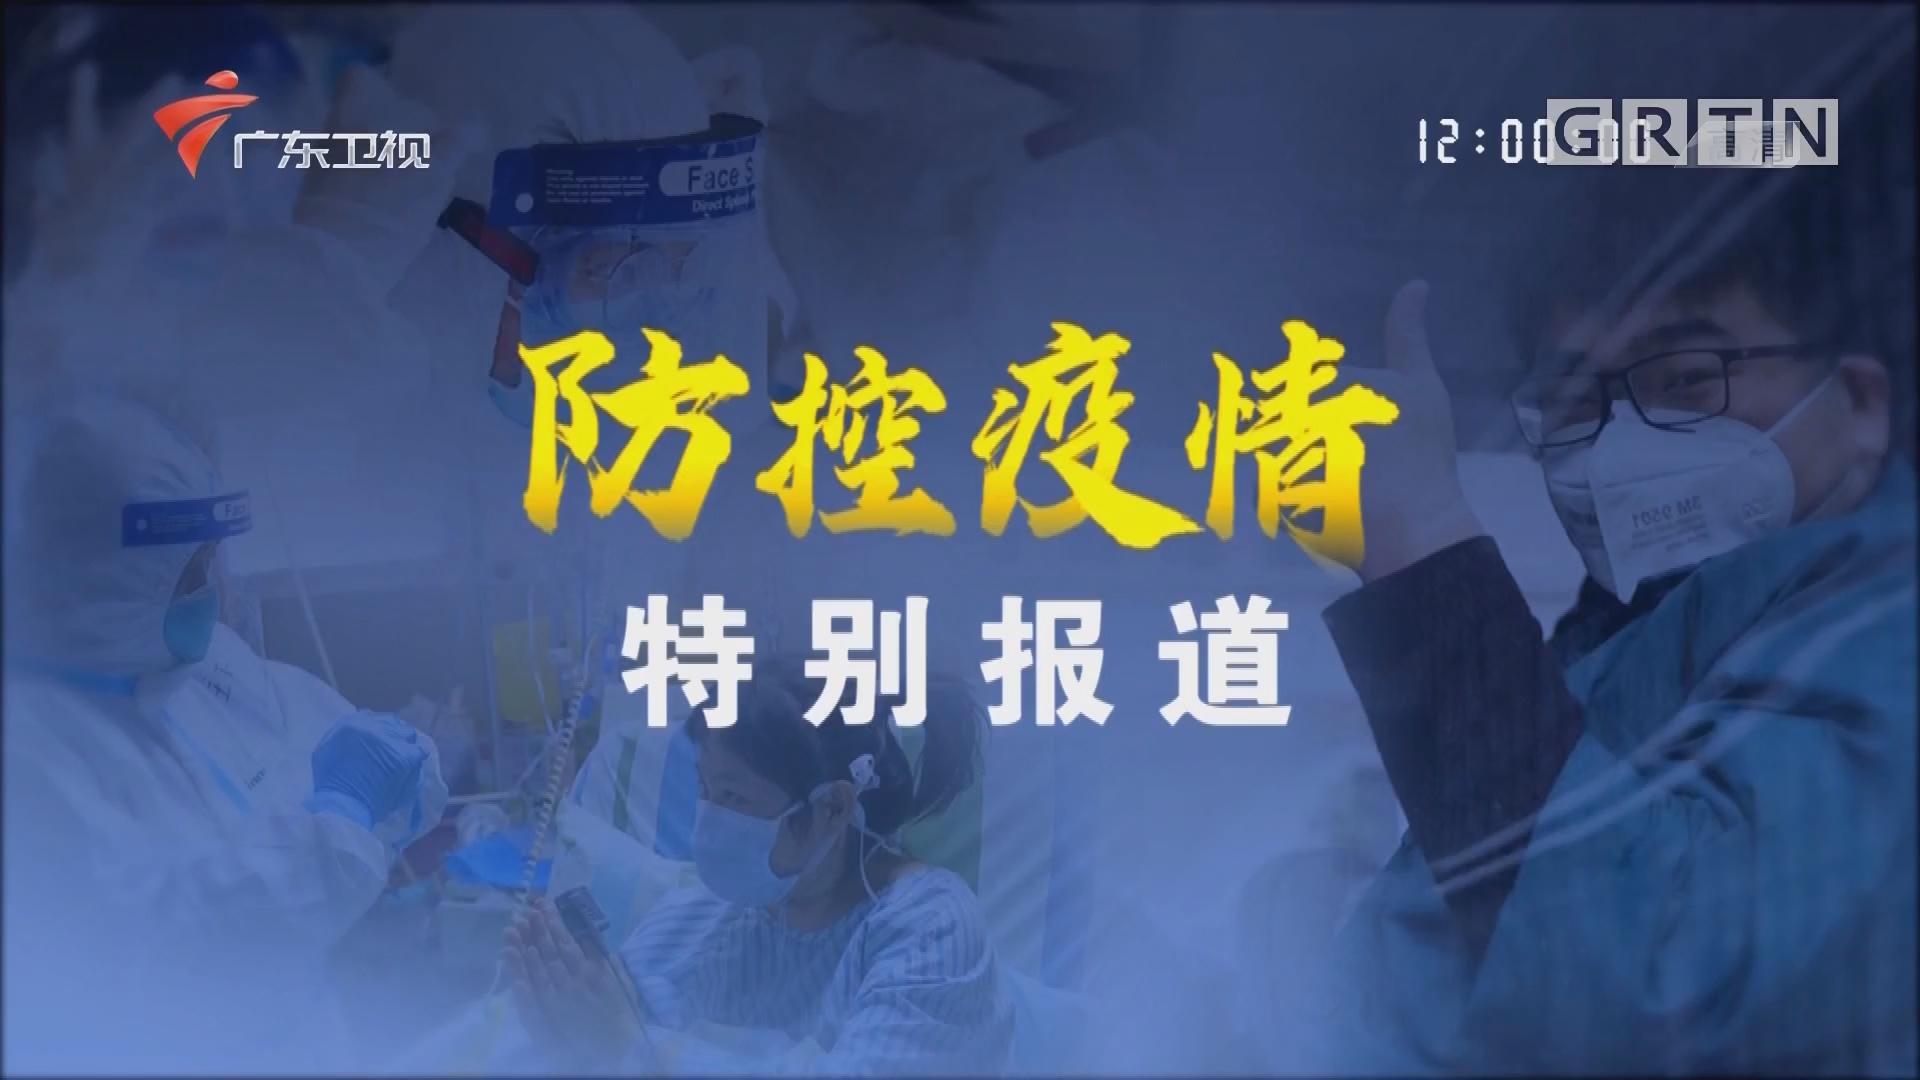 [HD][2020-03-20]防控疫情特别报道:防控疫情最前线:广东医疗队1087名医护人员今天回家